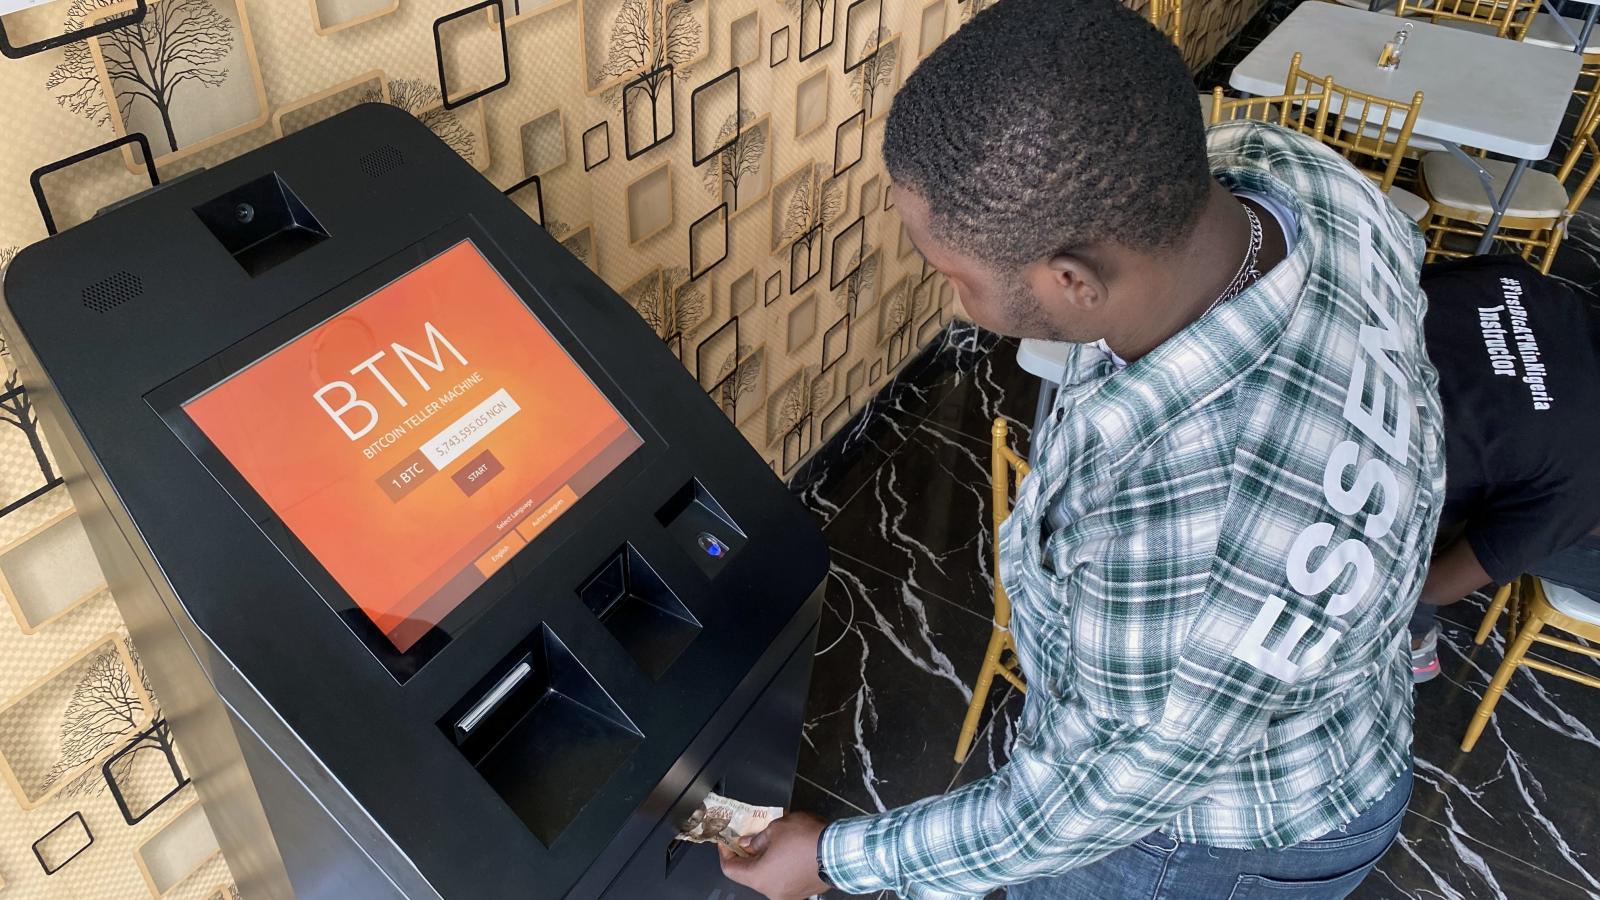 Nigerians Defy Central Bank, Flock to Bitcoin - AZCoin News